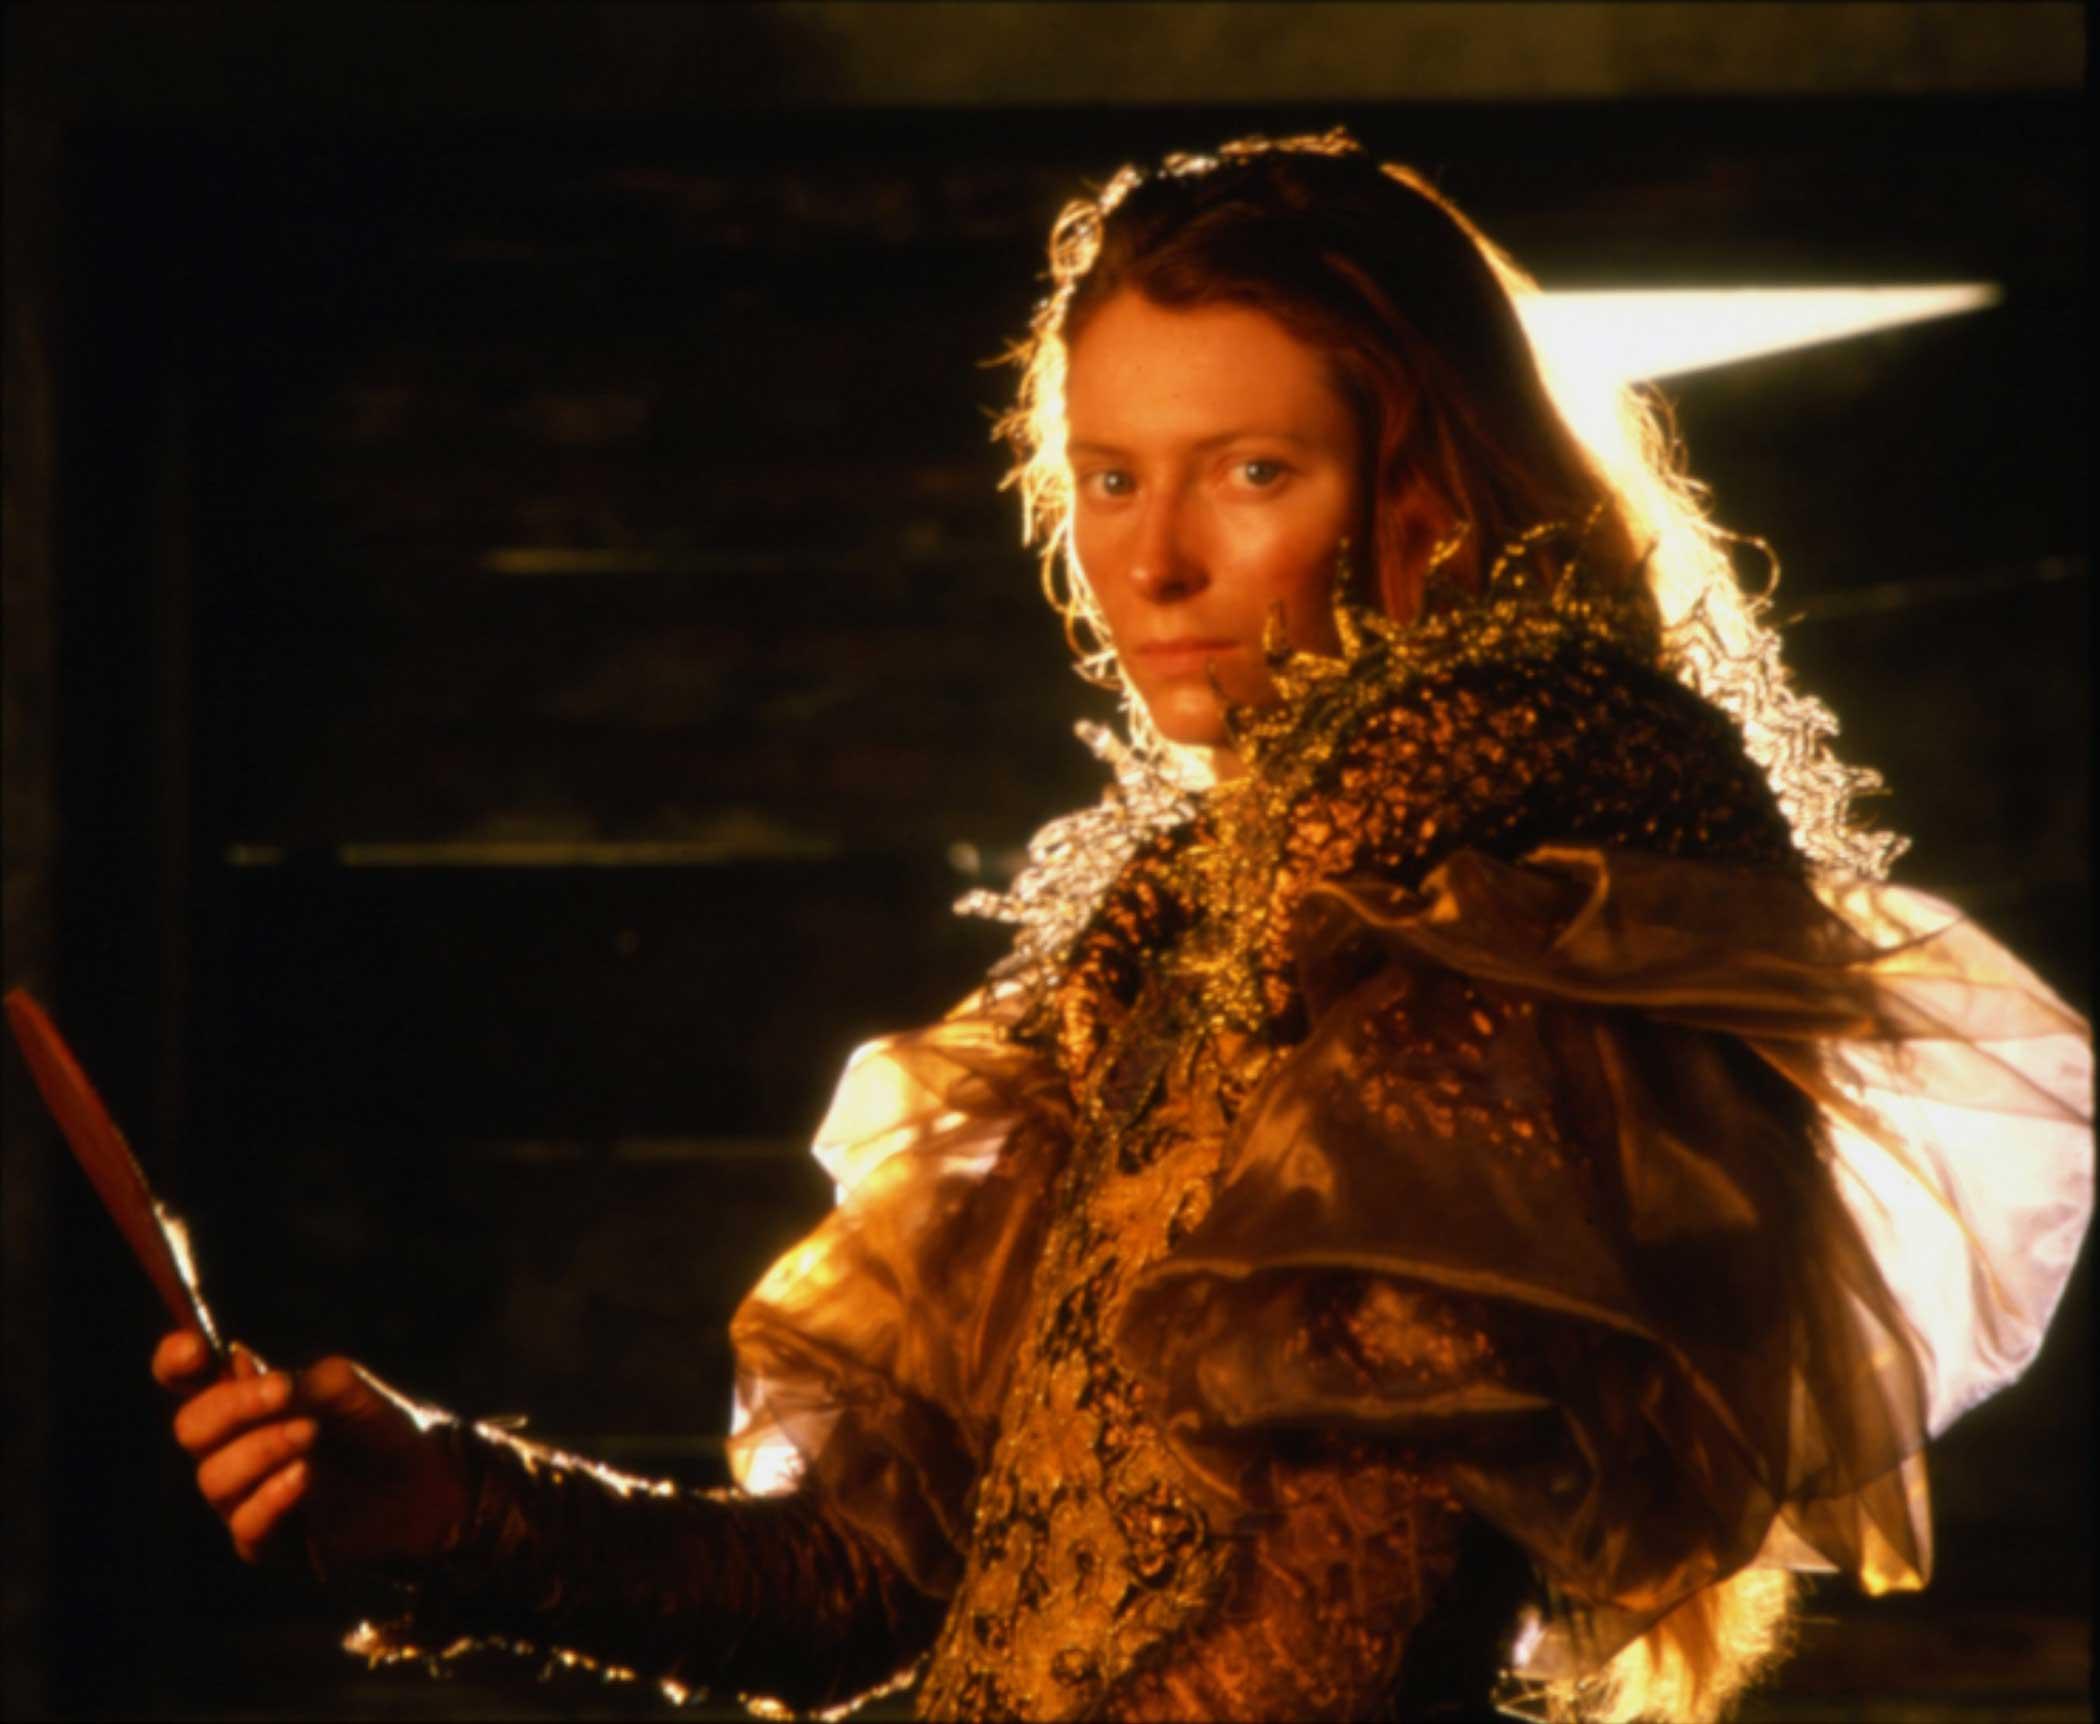 Tilda Swinton as Lena in Caravaggio in 1986.